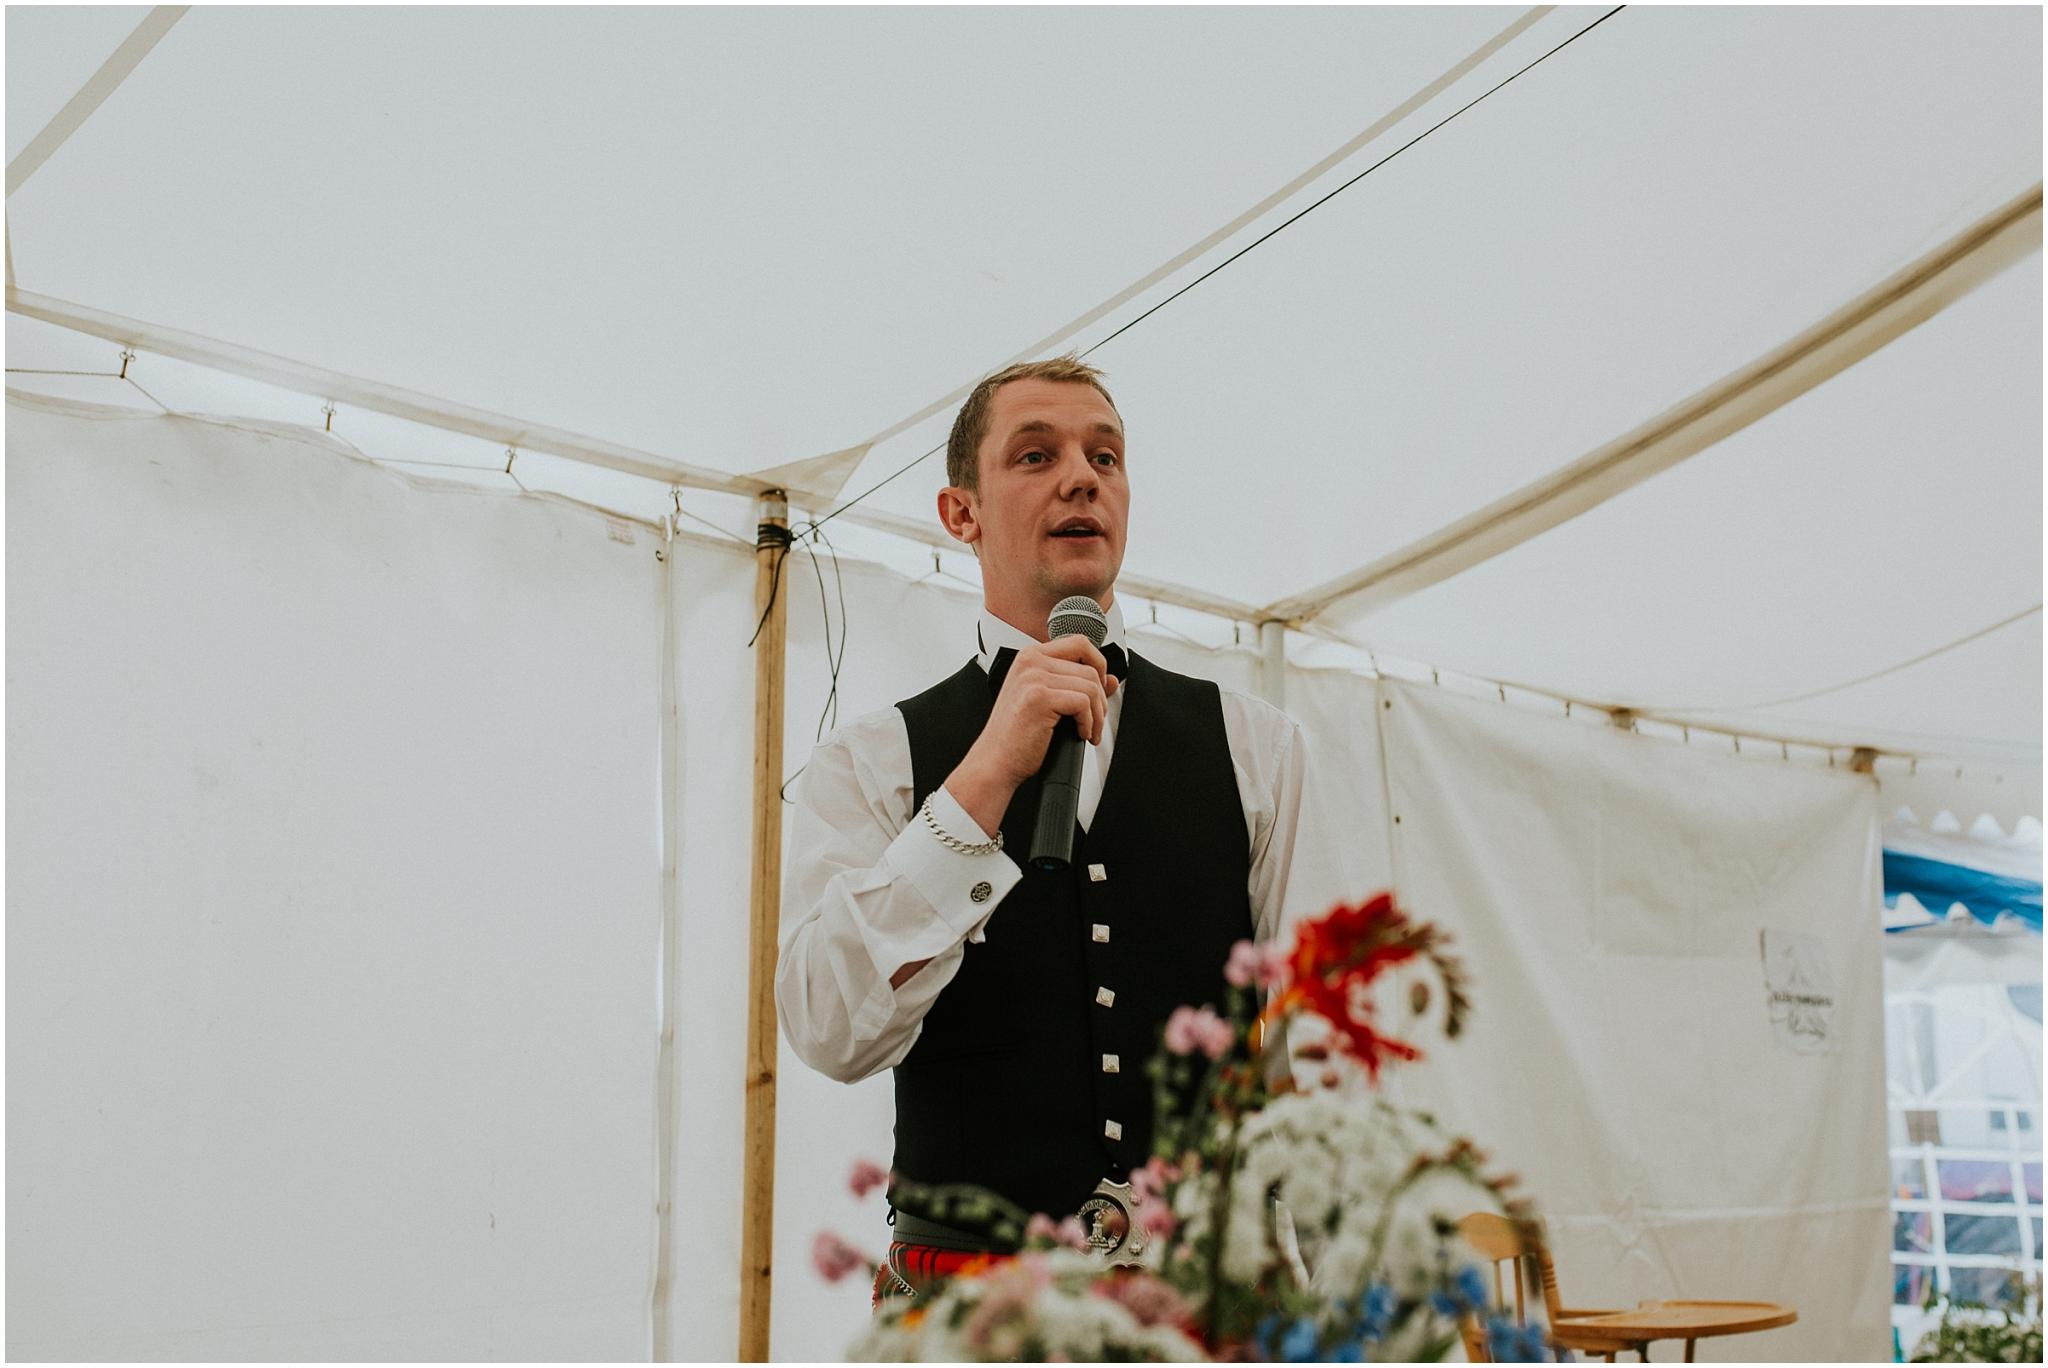 eilidhandpeter,isleofnorthuist,marqueewedding,northuist,northuistwedding,outerhebrides,outerhebrideswedding,wedding,weddingphotography,